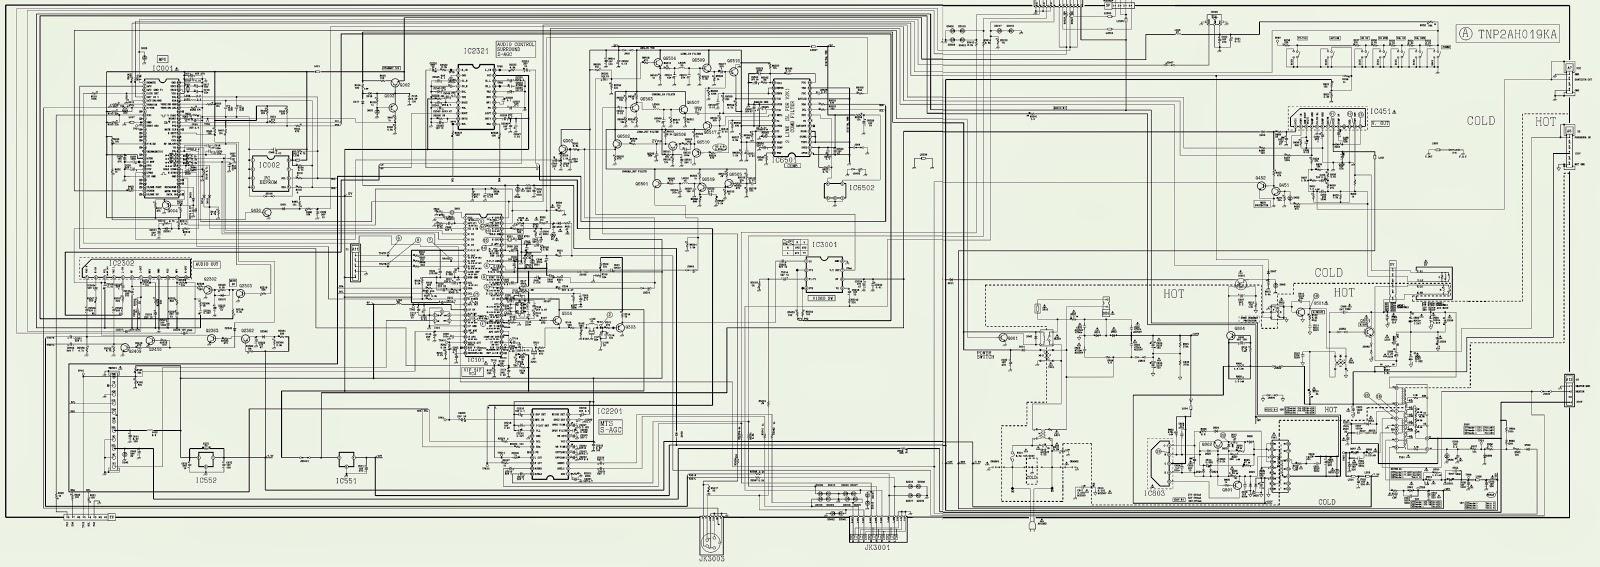 CT20SX11CE  CT20SX11E  PANASONIC TV  CIRCUIT DIAGRAM